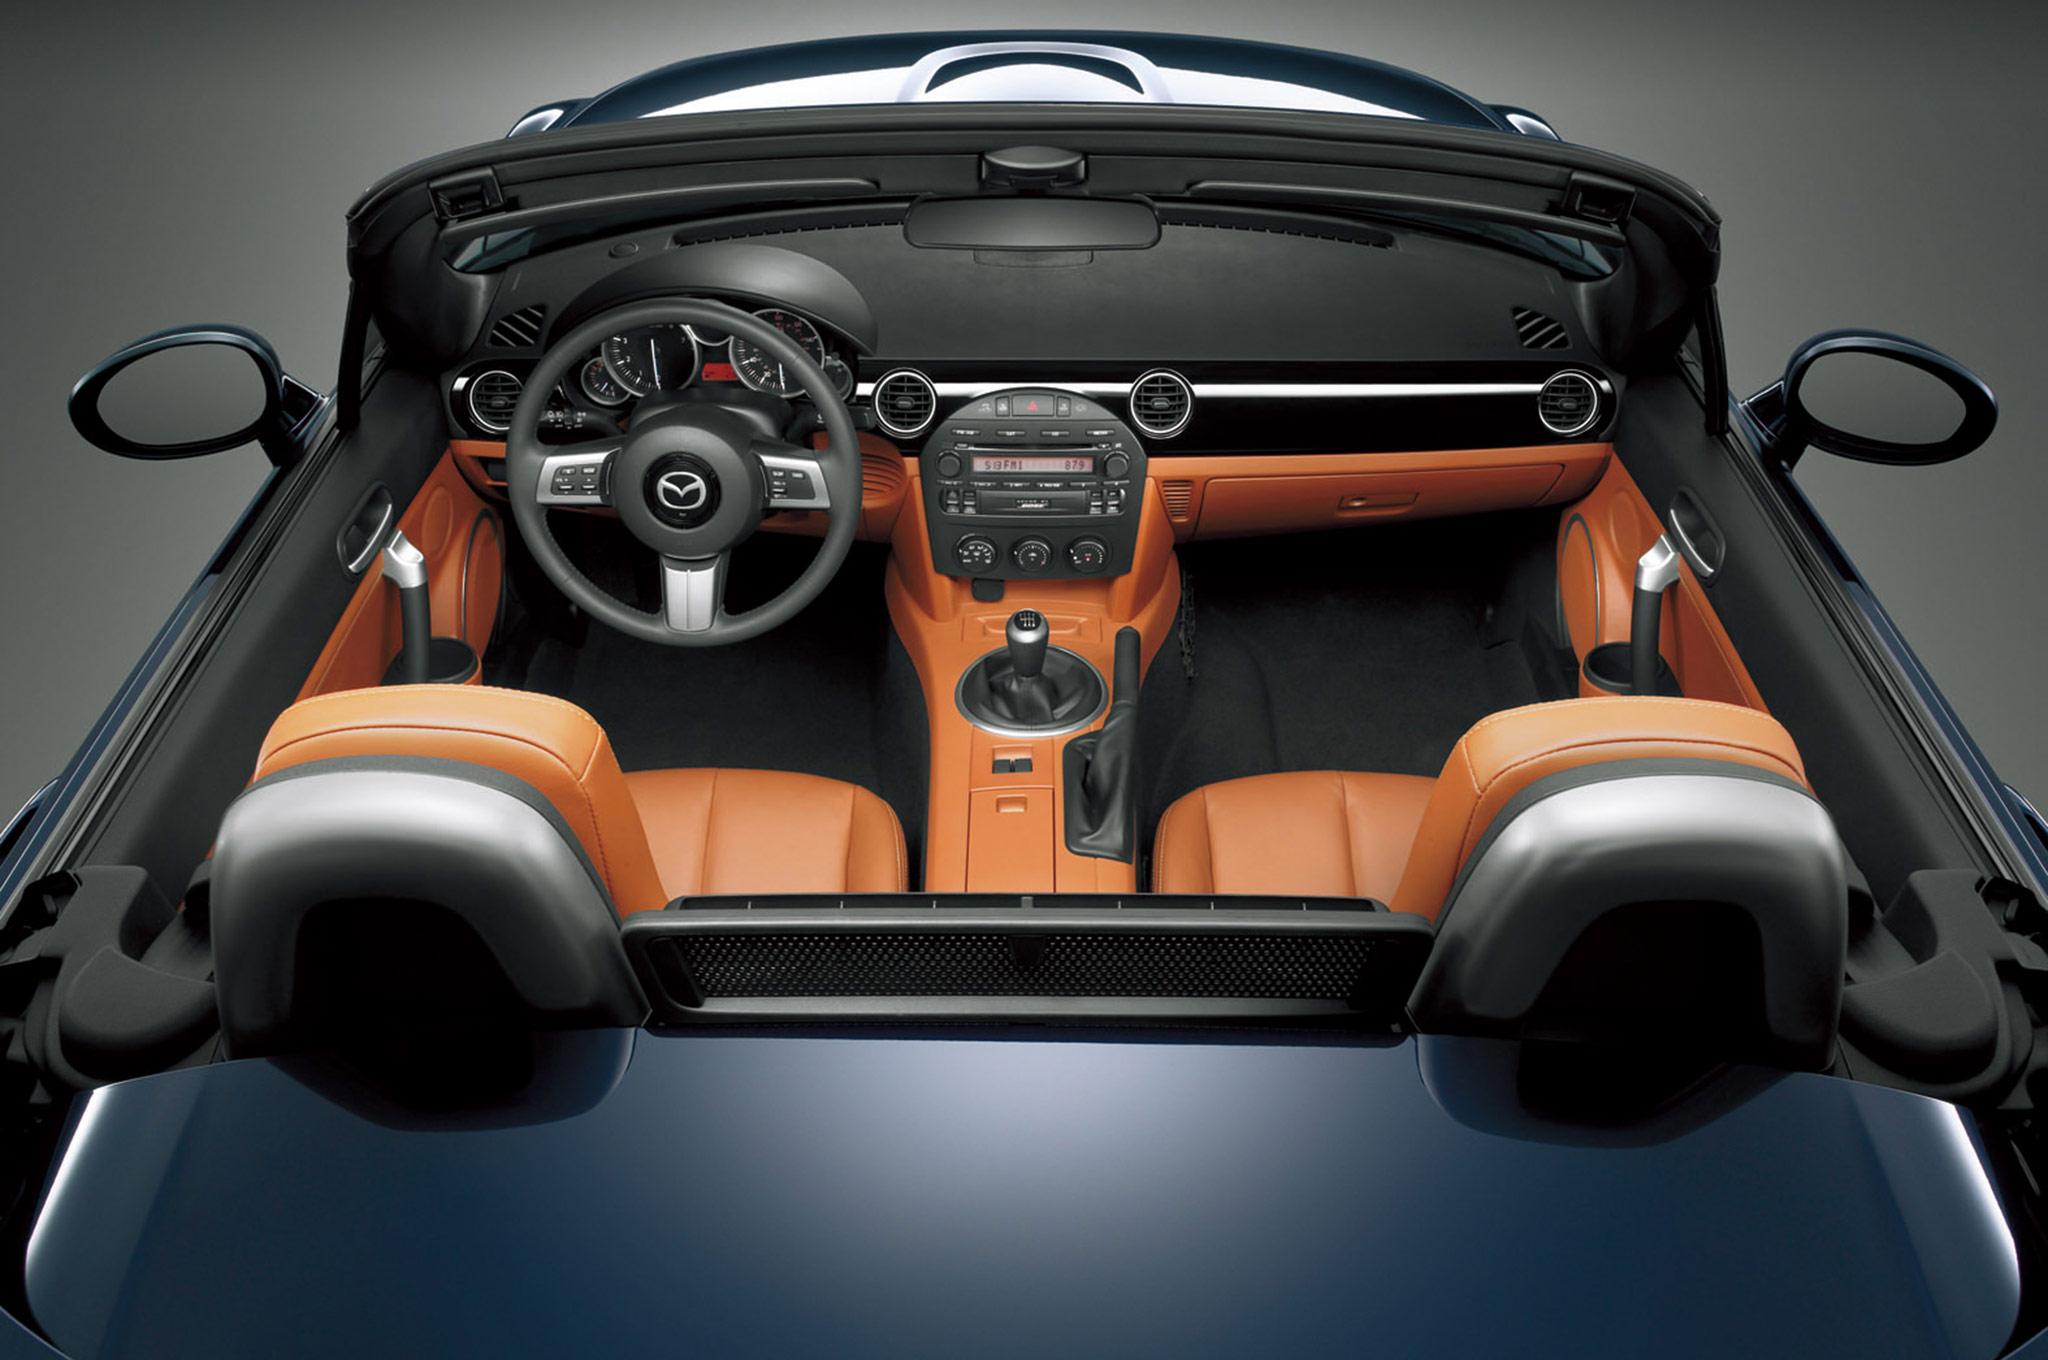 2006 mazda mx 5 miata review rh automobilemag com Miata Manual Transmission Mazda Miata Owner's Manual